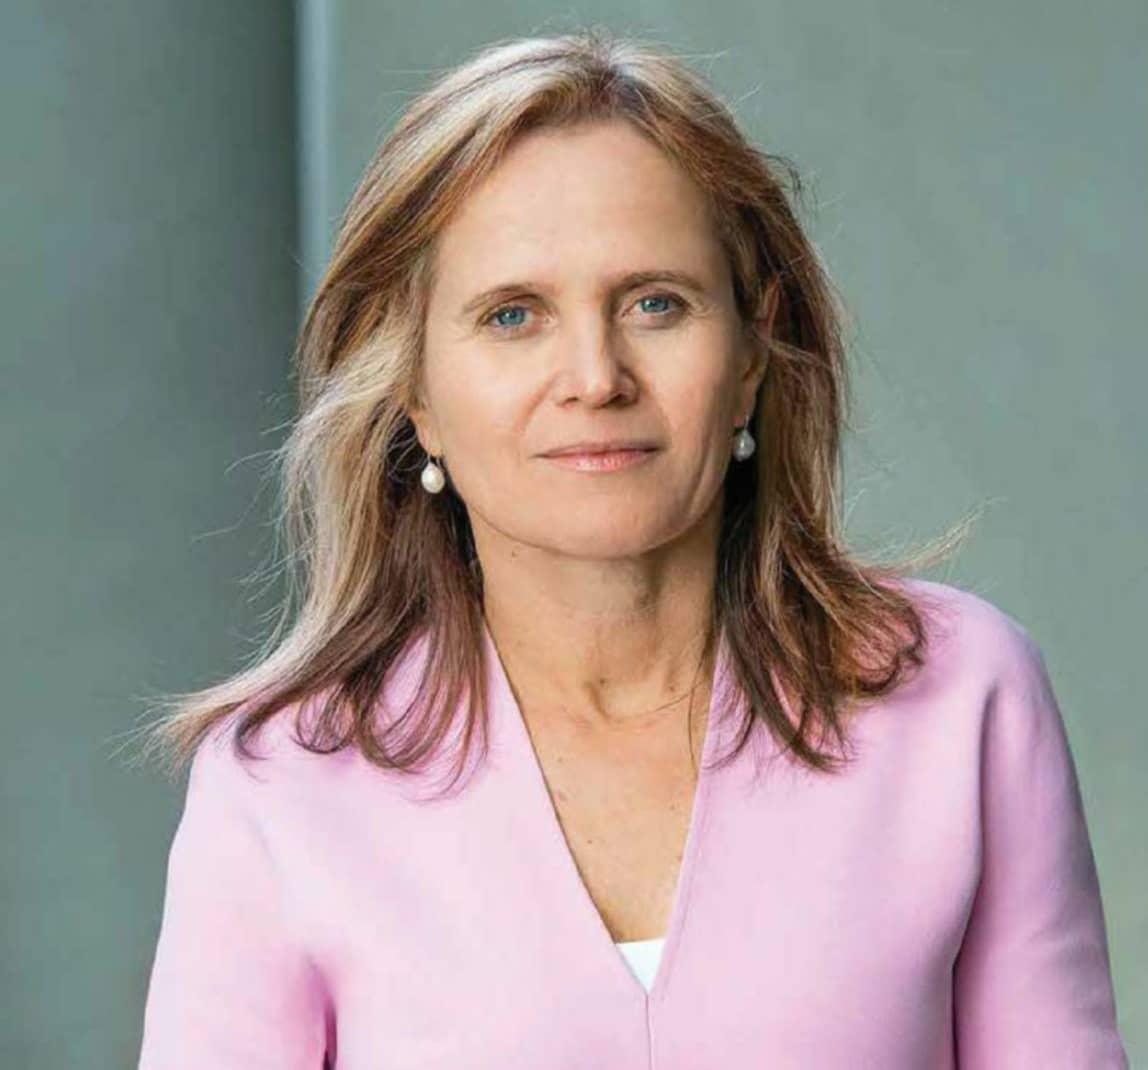 THE WOMEN WHO MADE ME: PROFESSOR SHARON LEWIN